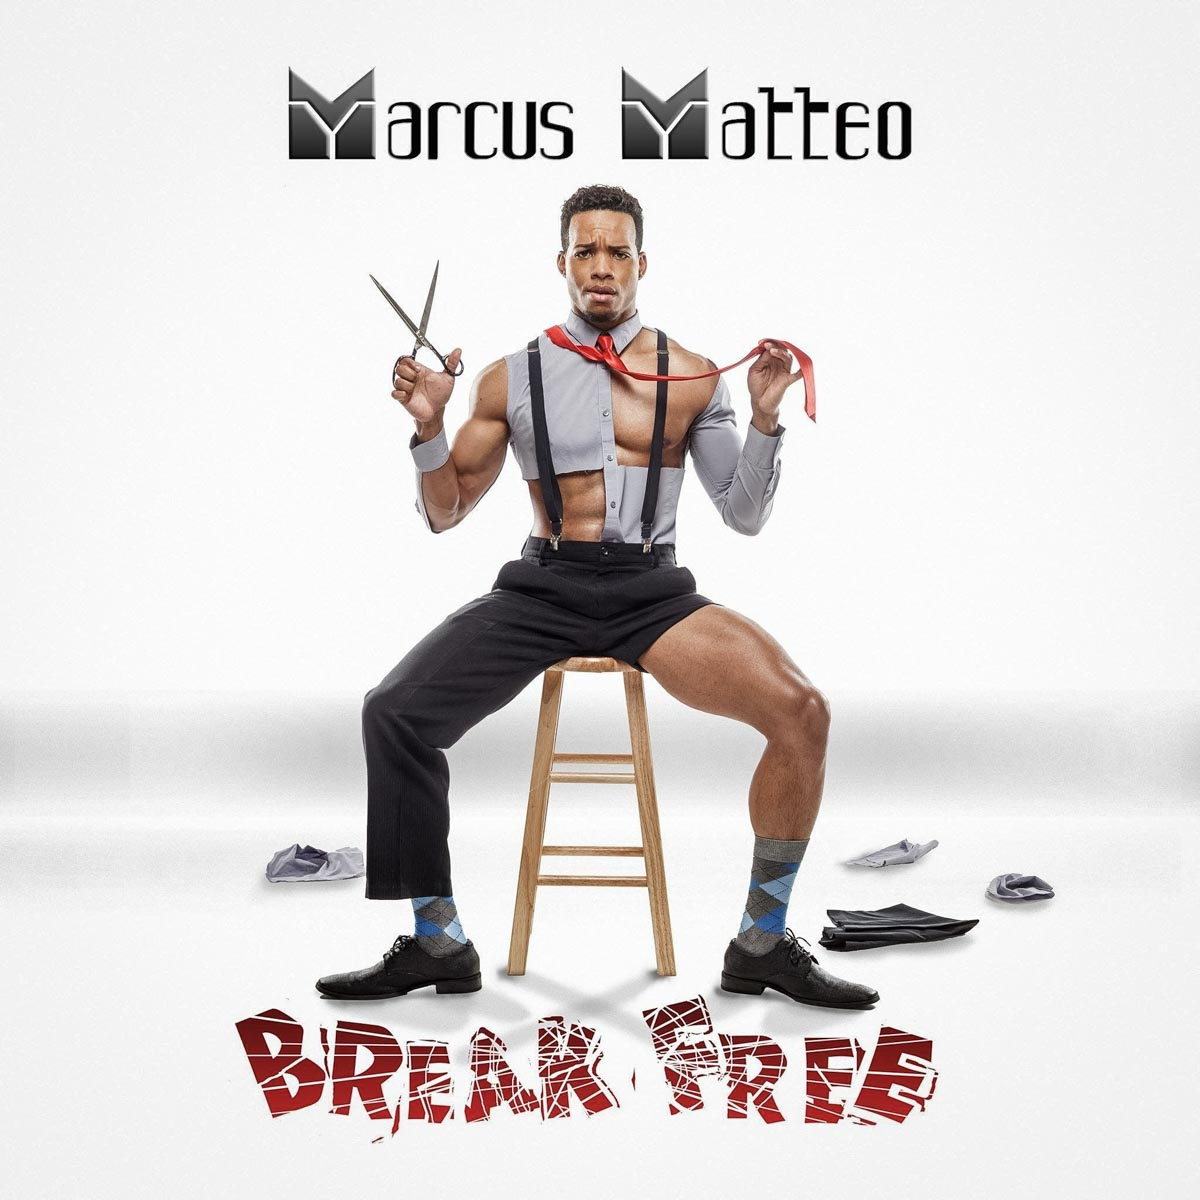 Album cover for singer Marcus Matteo by Chicago Portrait Photographer John Gress